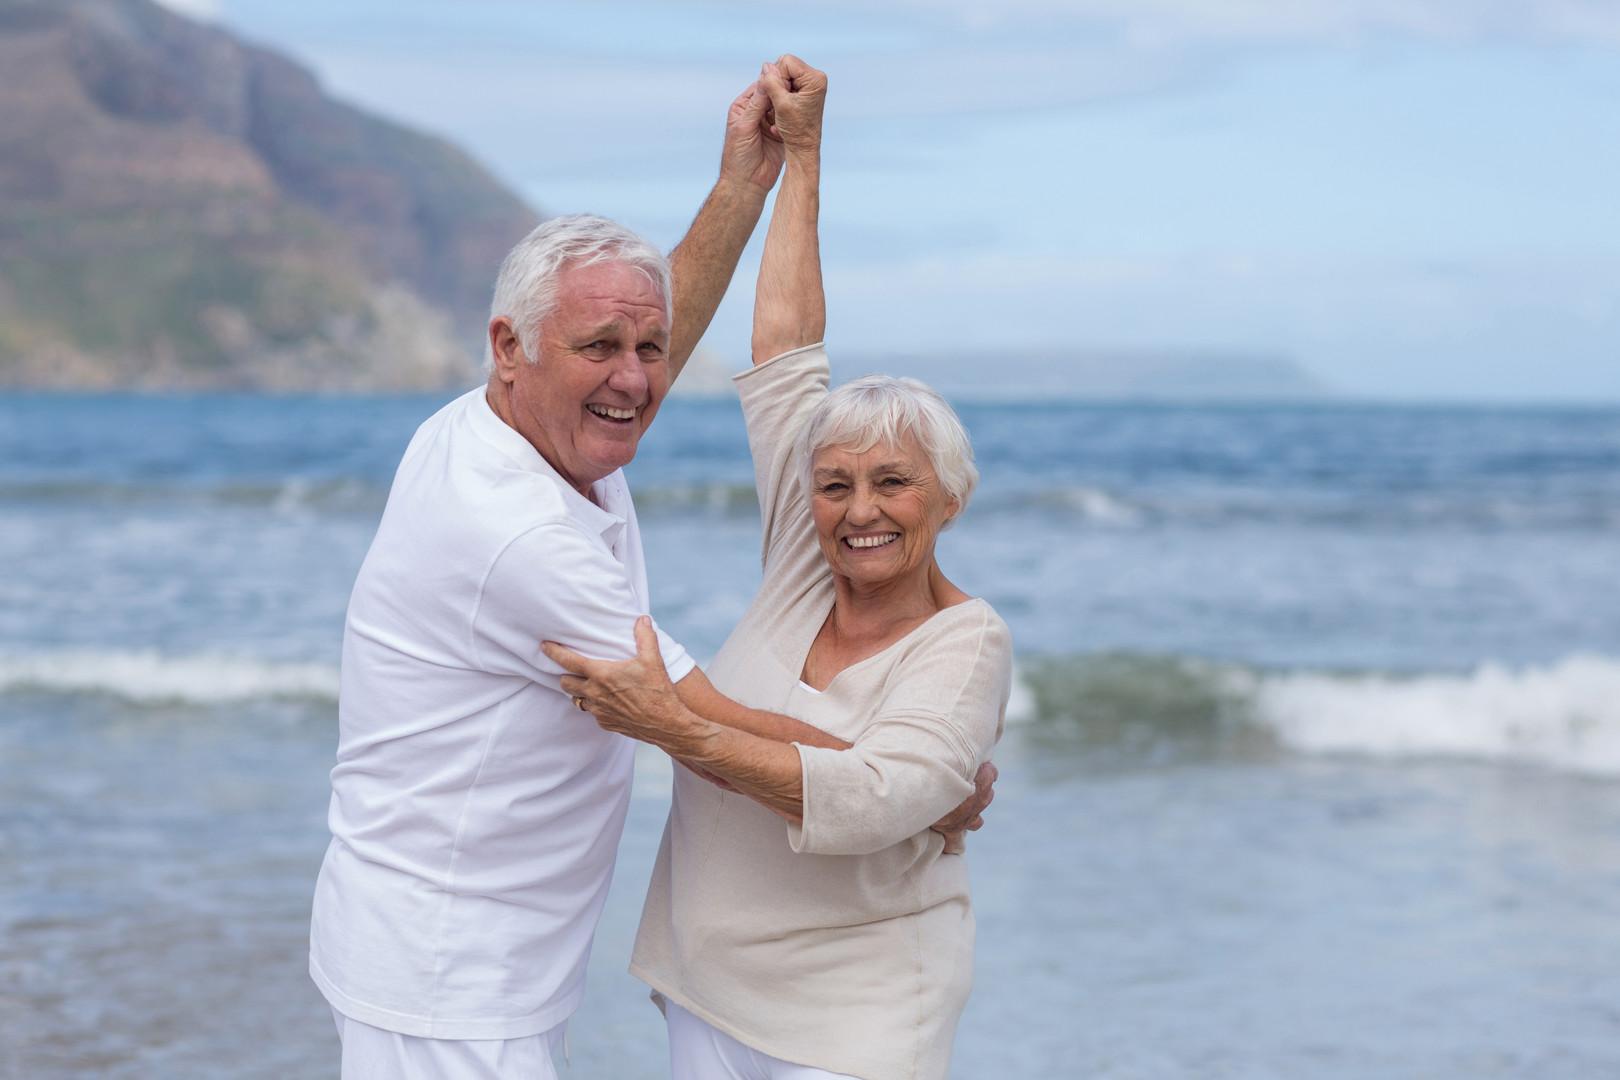 senior-couple-having-fun-together-at-bea